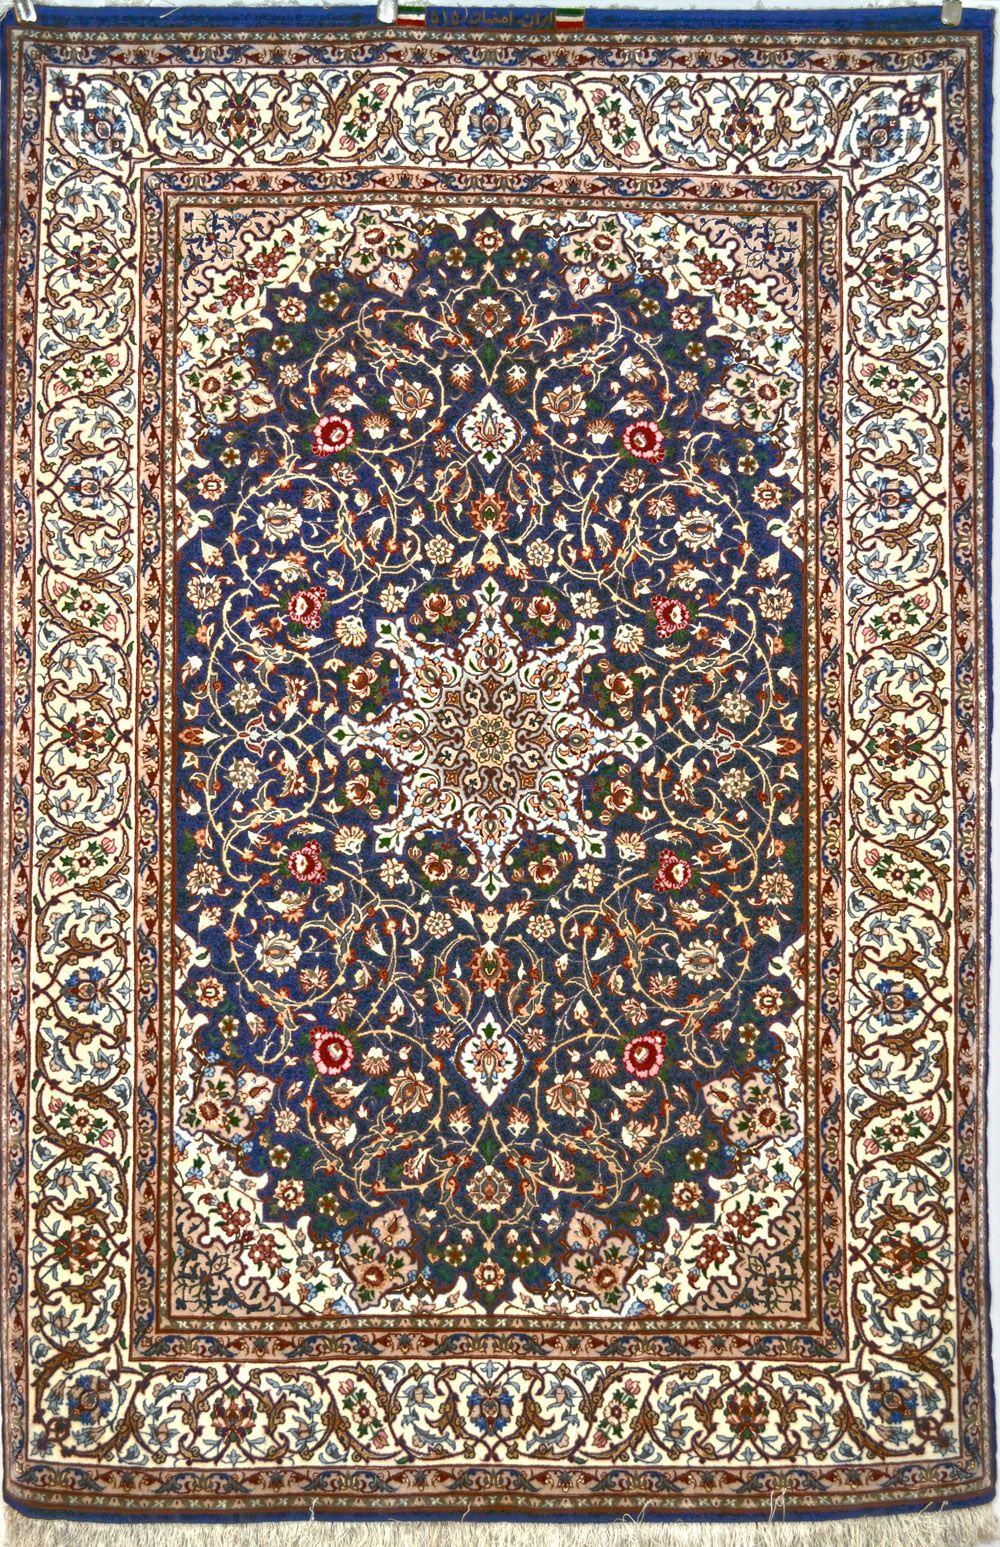 isfahan fine silk persian rug item pa902 isfahan silk area rug - 3x5 Rugs